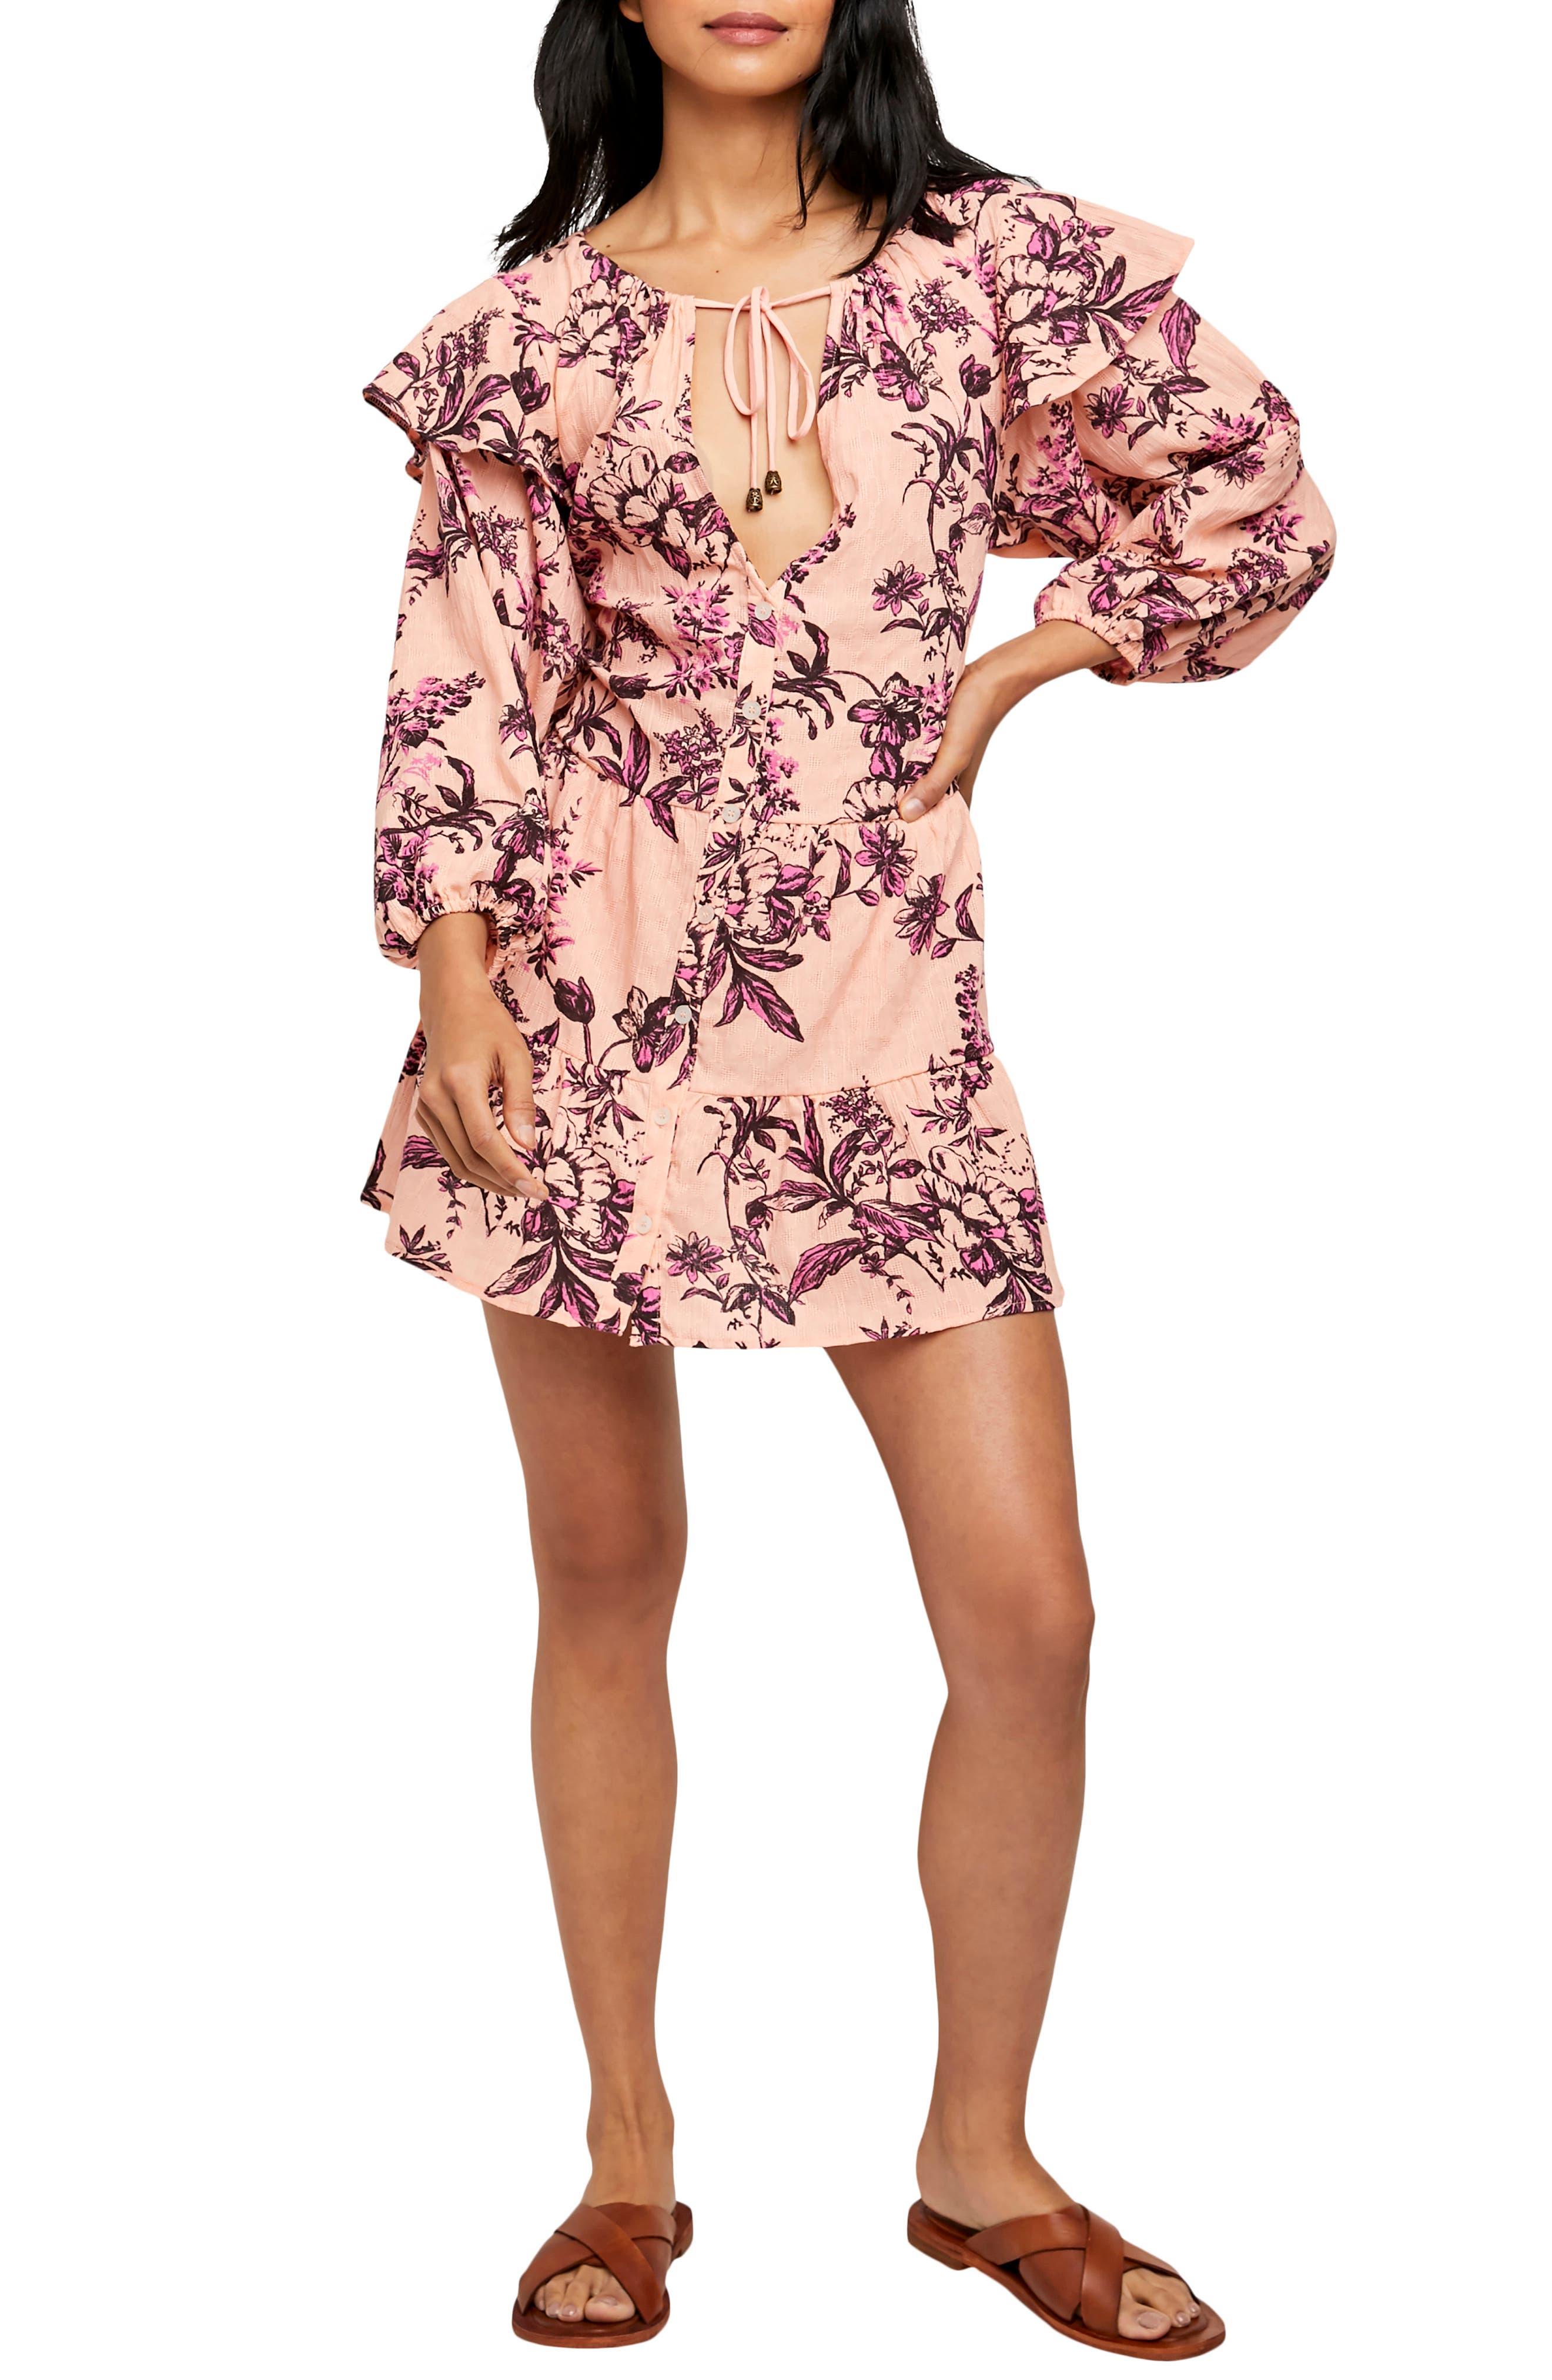 Sunbaked Floral Long Sleeve Swing Minidress